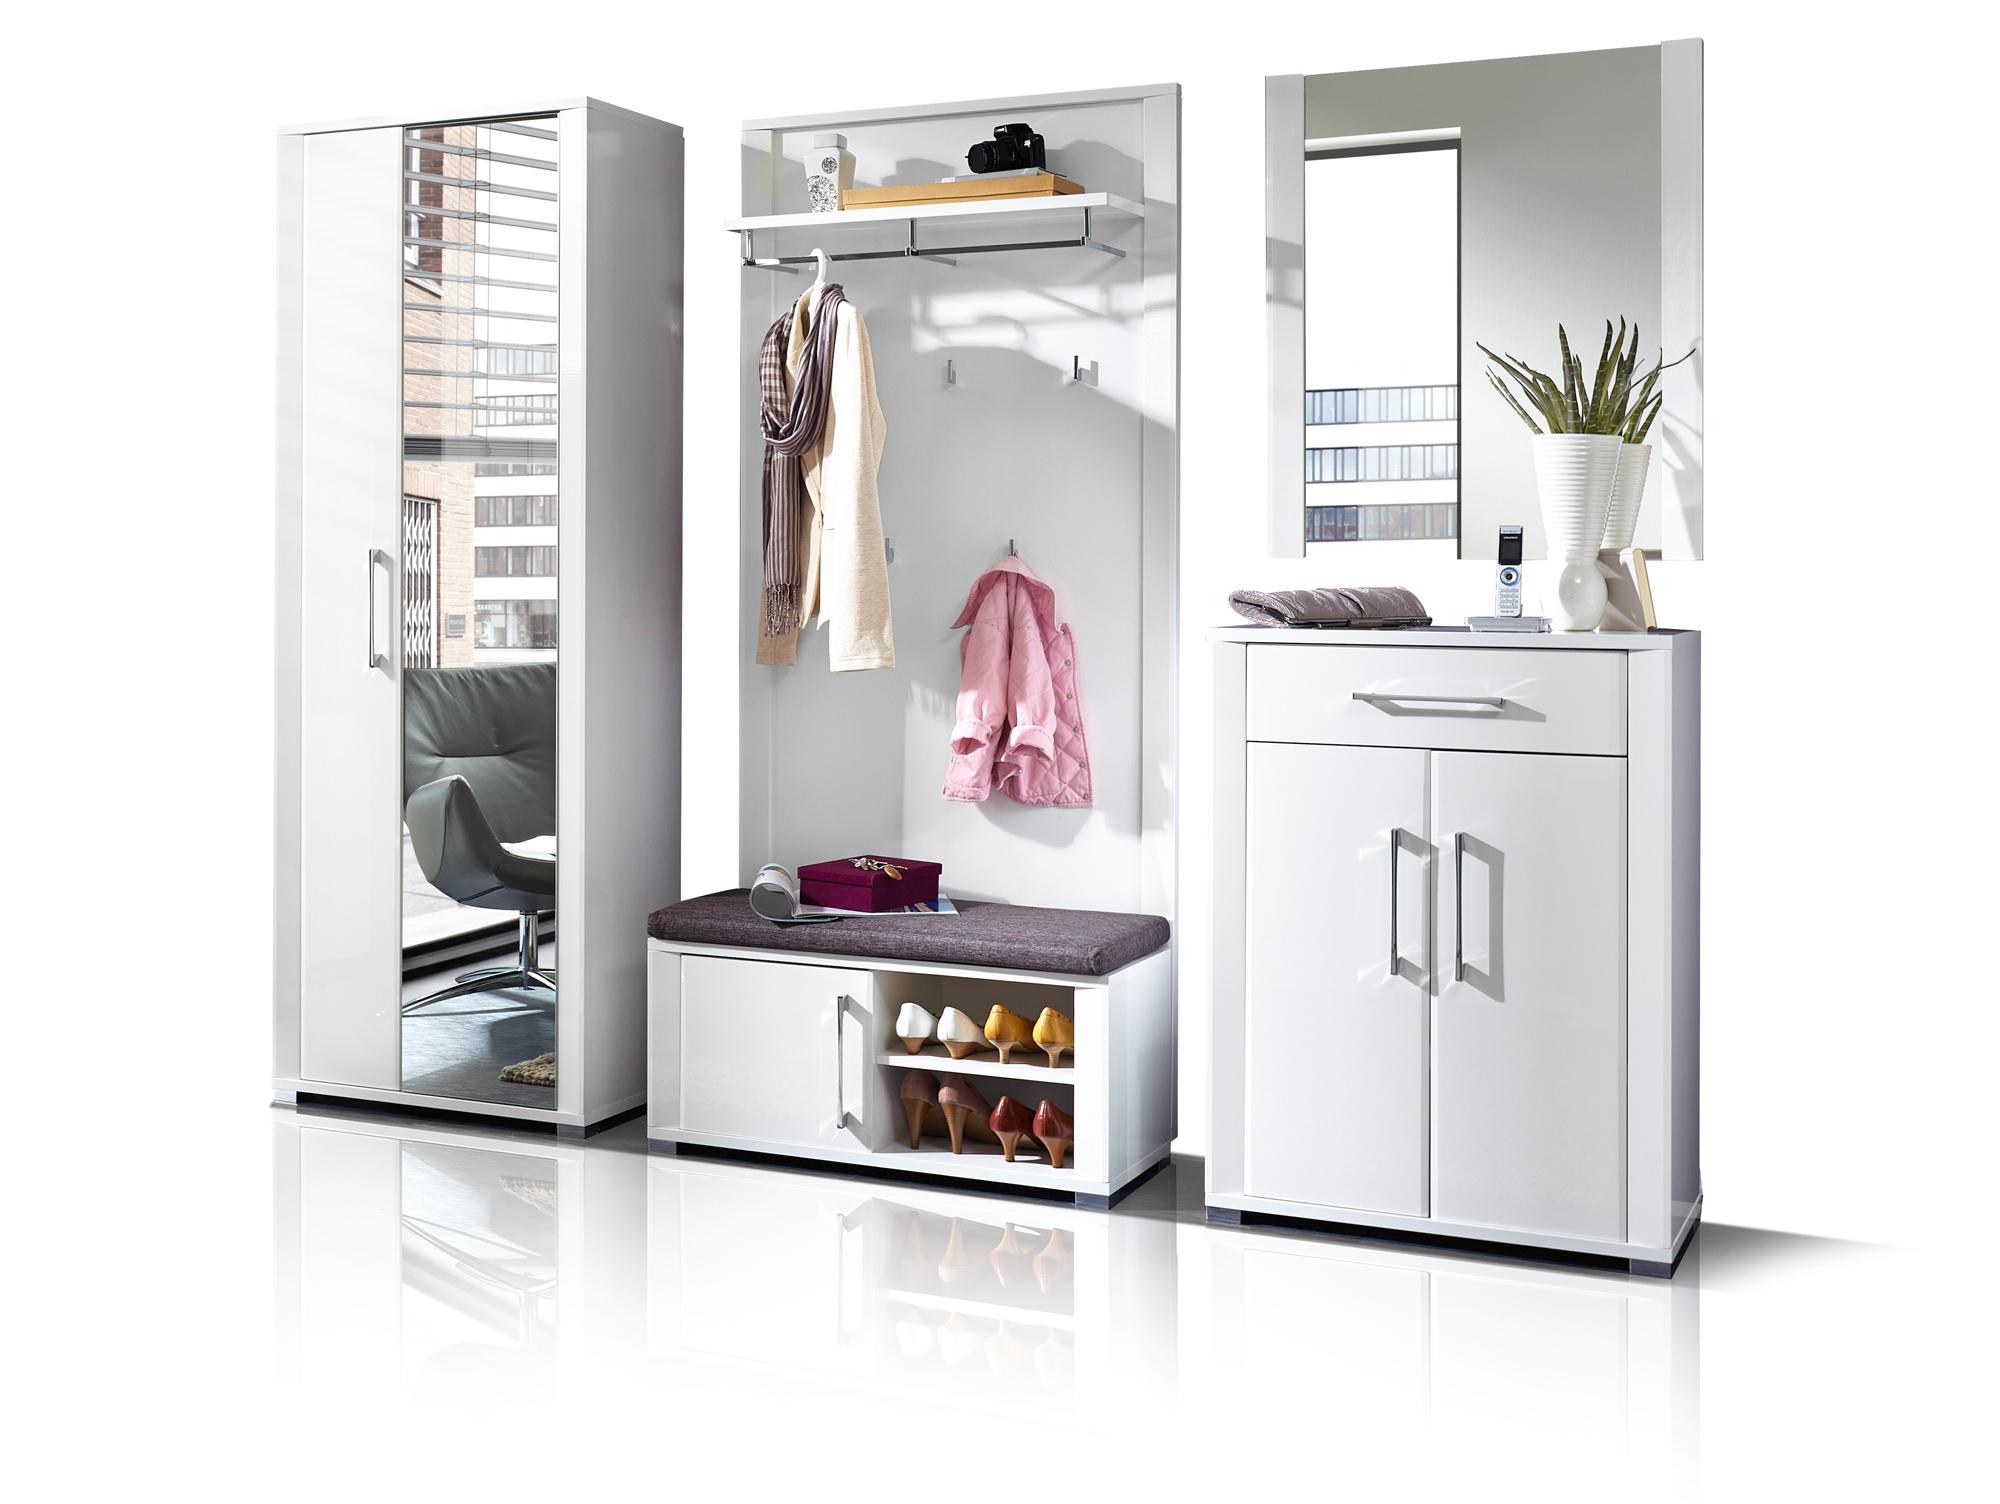 wandpaneel garderobe wei beautiful wandpaneele holz weiss wandpaneel holz weiss landhaus. Black Bedroom Furniture Sets. Home Design Ideas